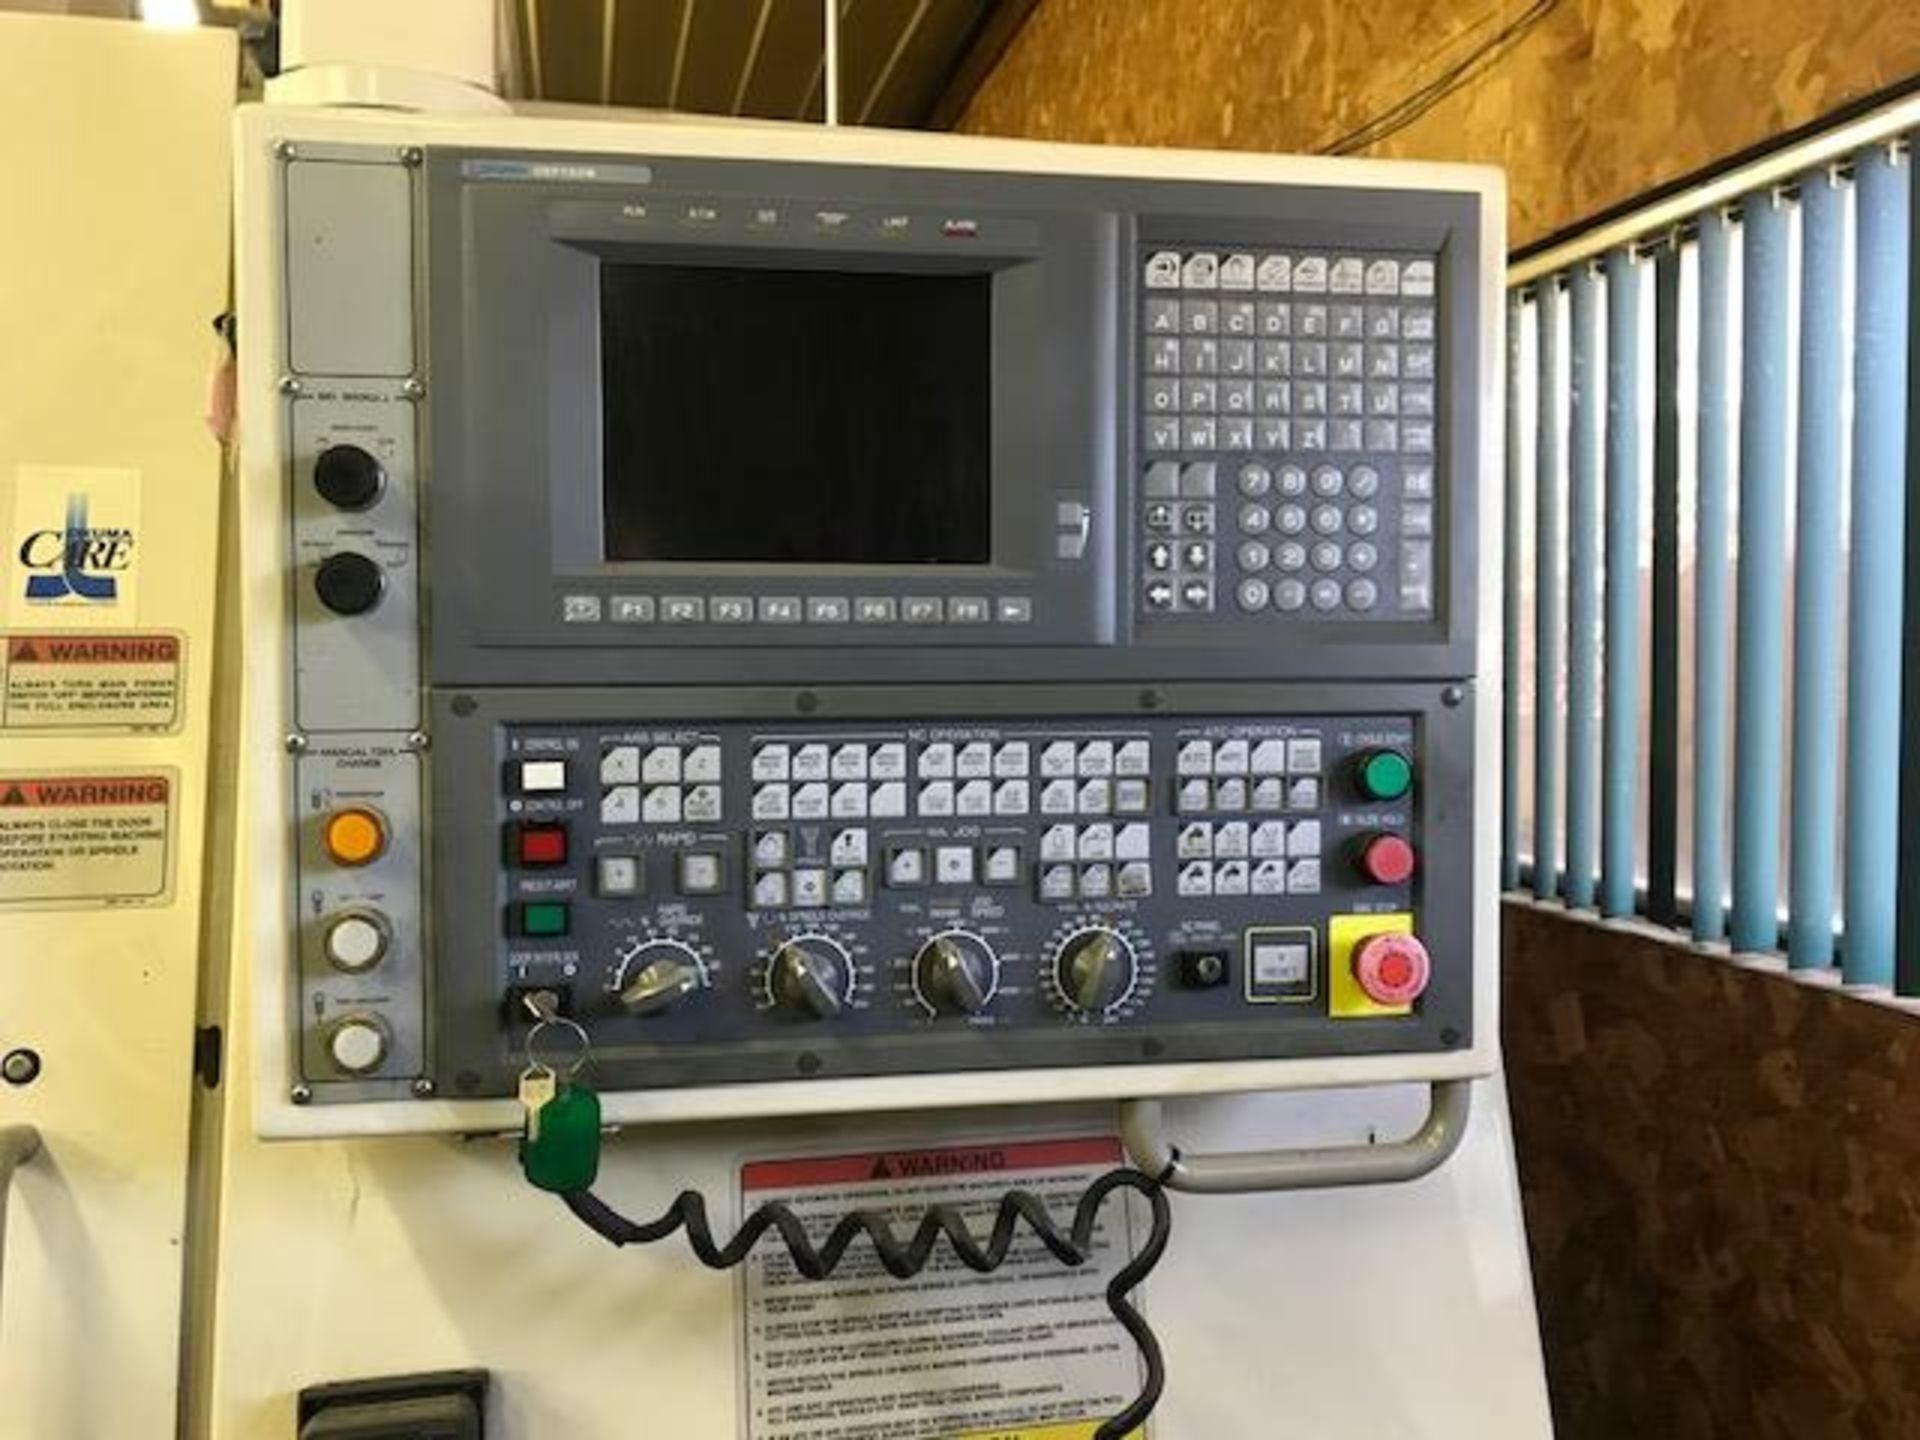 Lot 2D - OKUMA VERTICAL MACHINING CENTER, MODEL CADET MATE, S/N 0507, (LOCATION: SOUTH BEND, IN) ***RIGGING